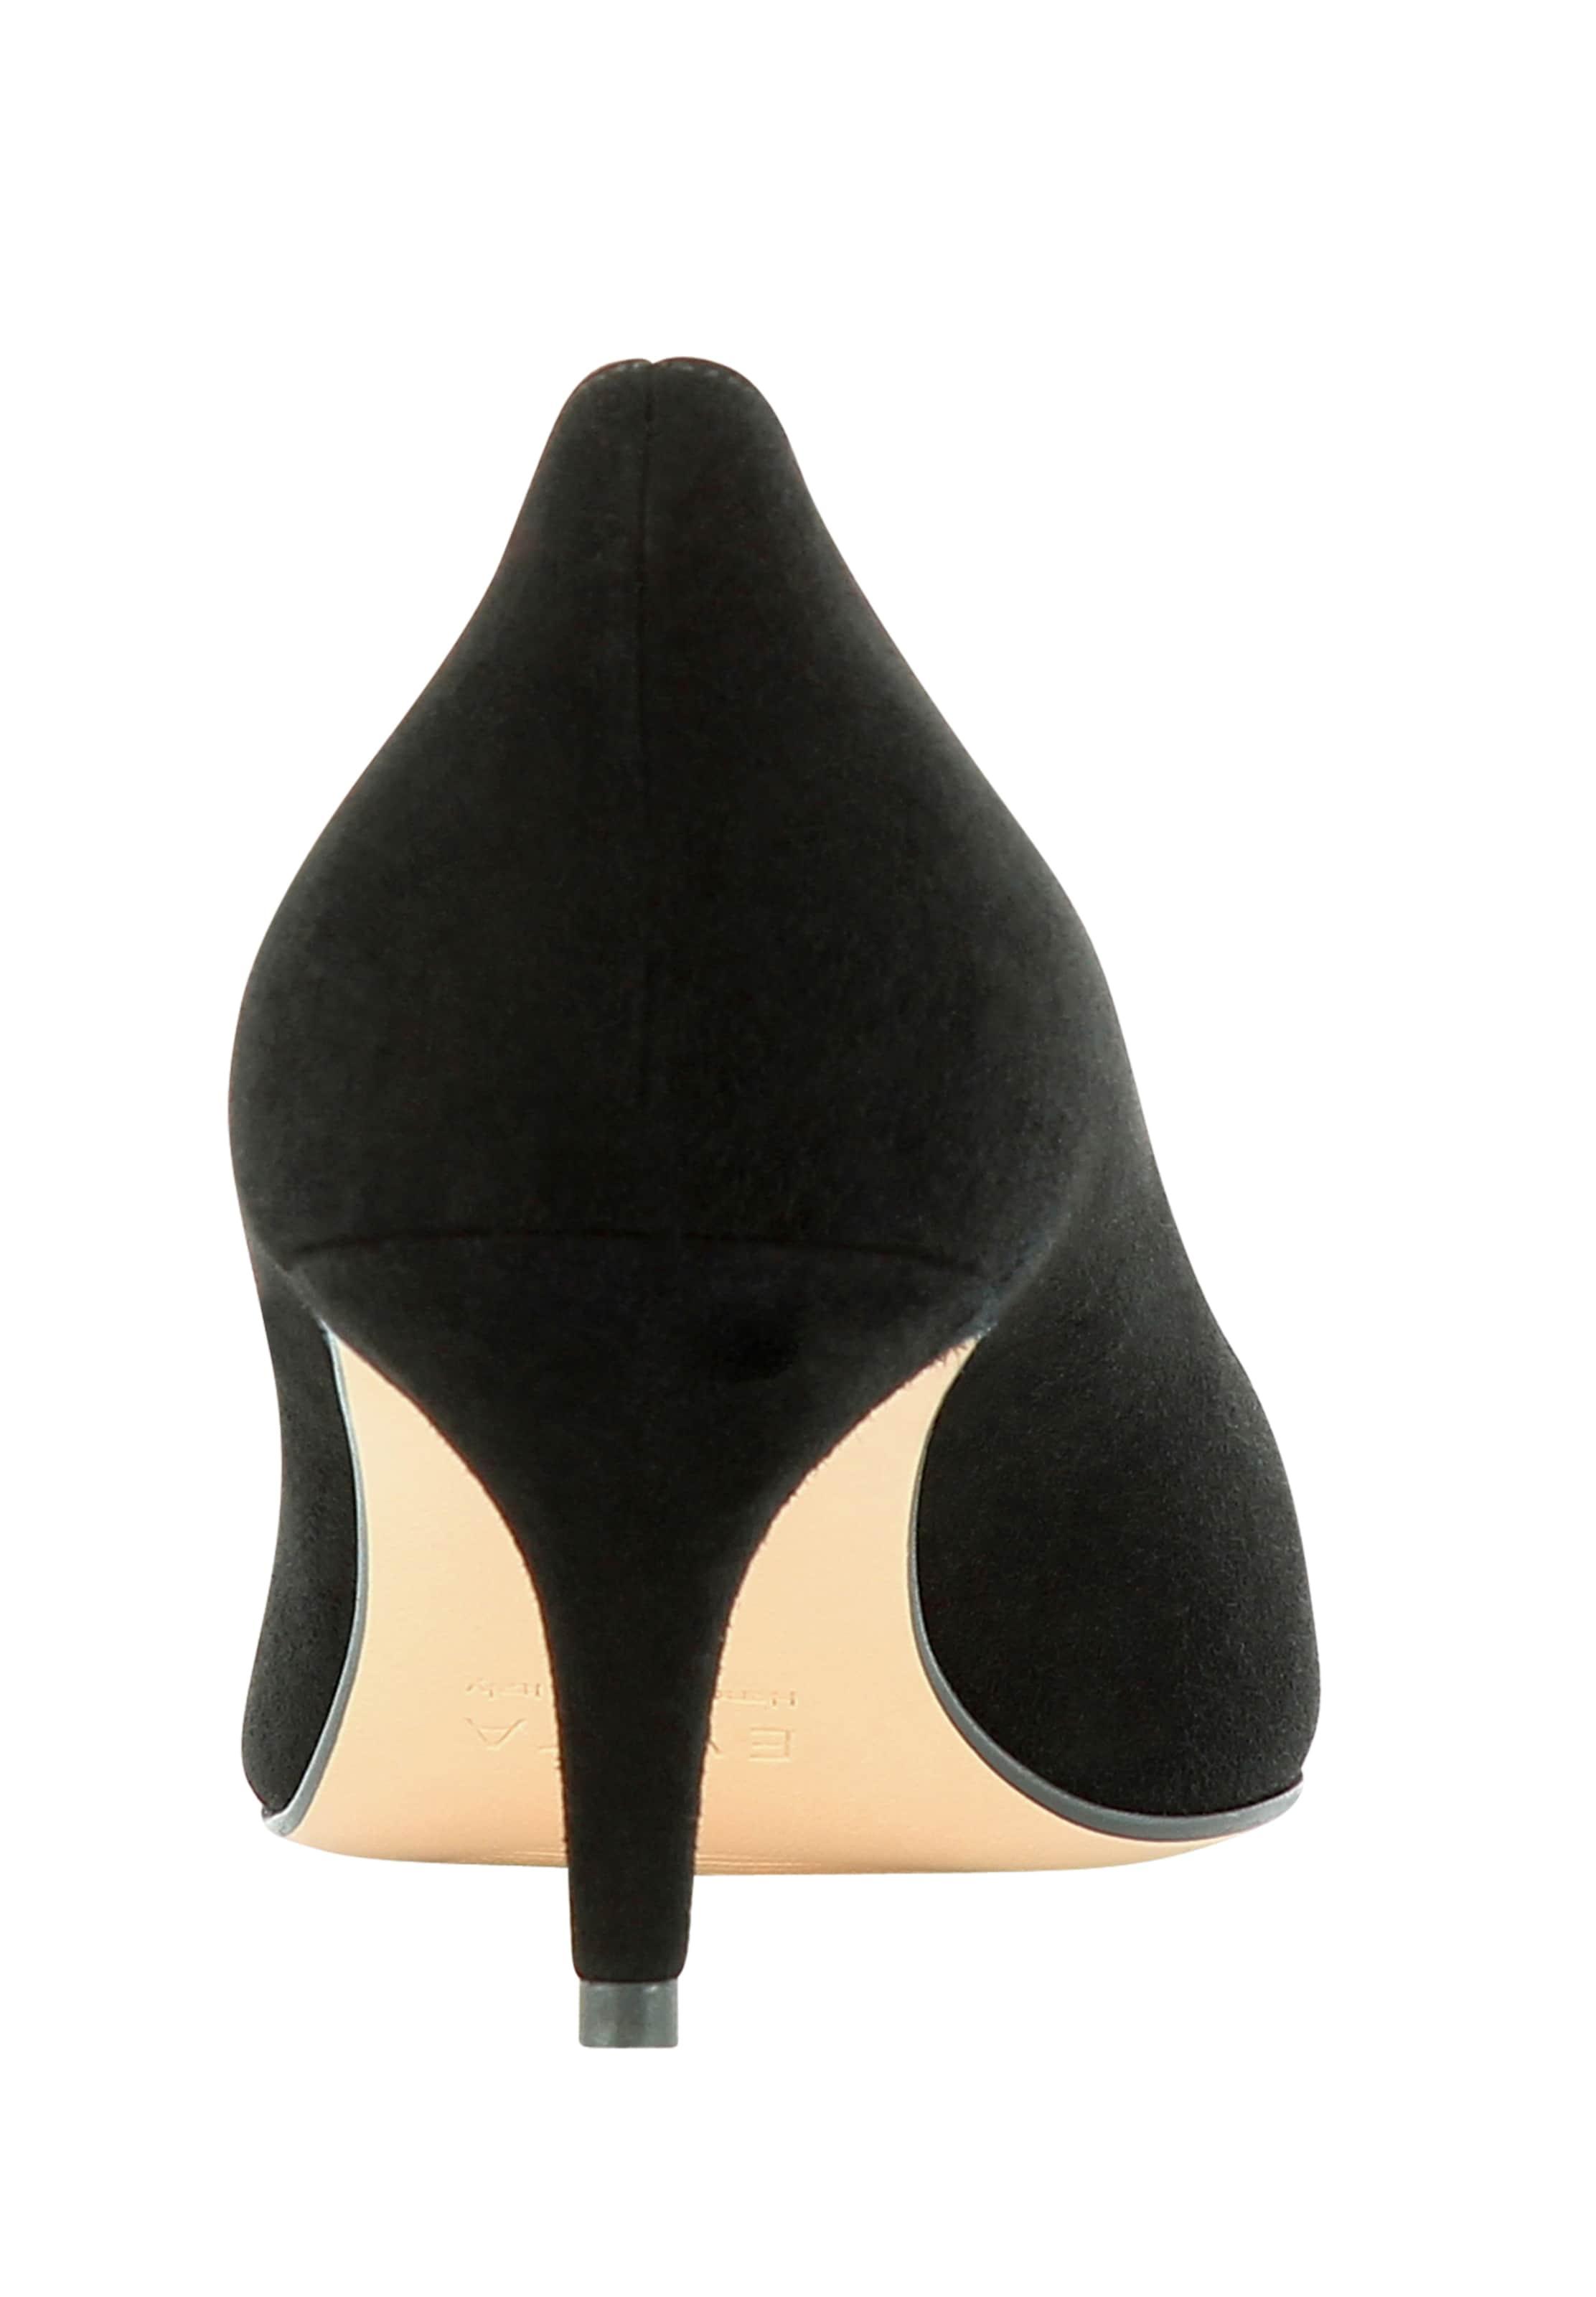 Noir En Evita Evita Escarpins Escarpins 5c4LRSq3Aj